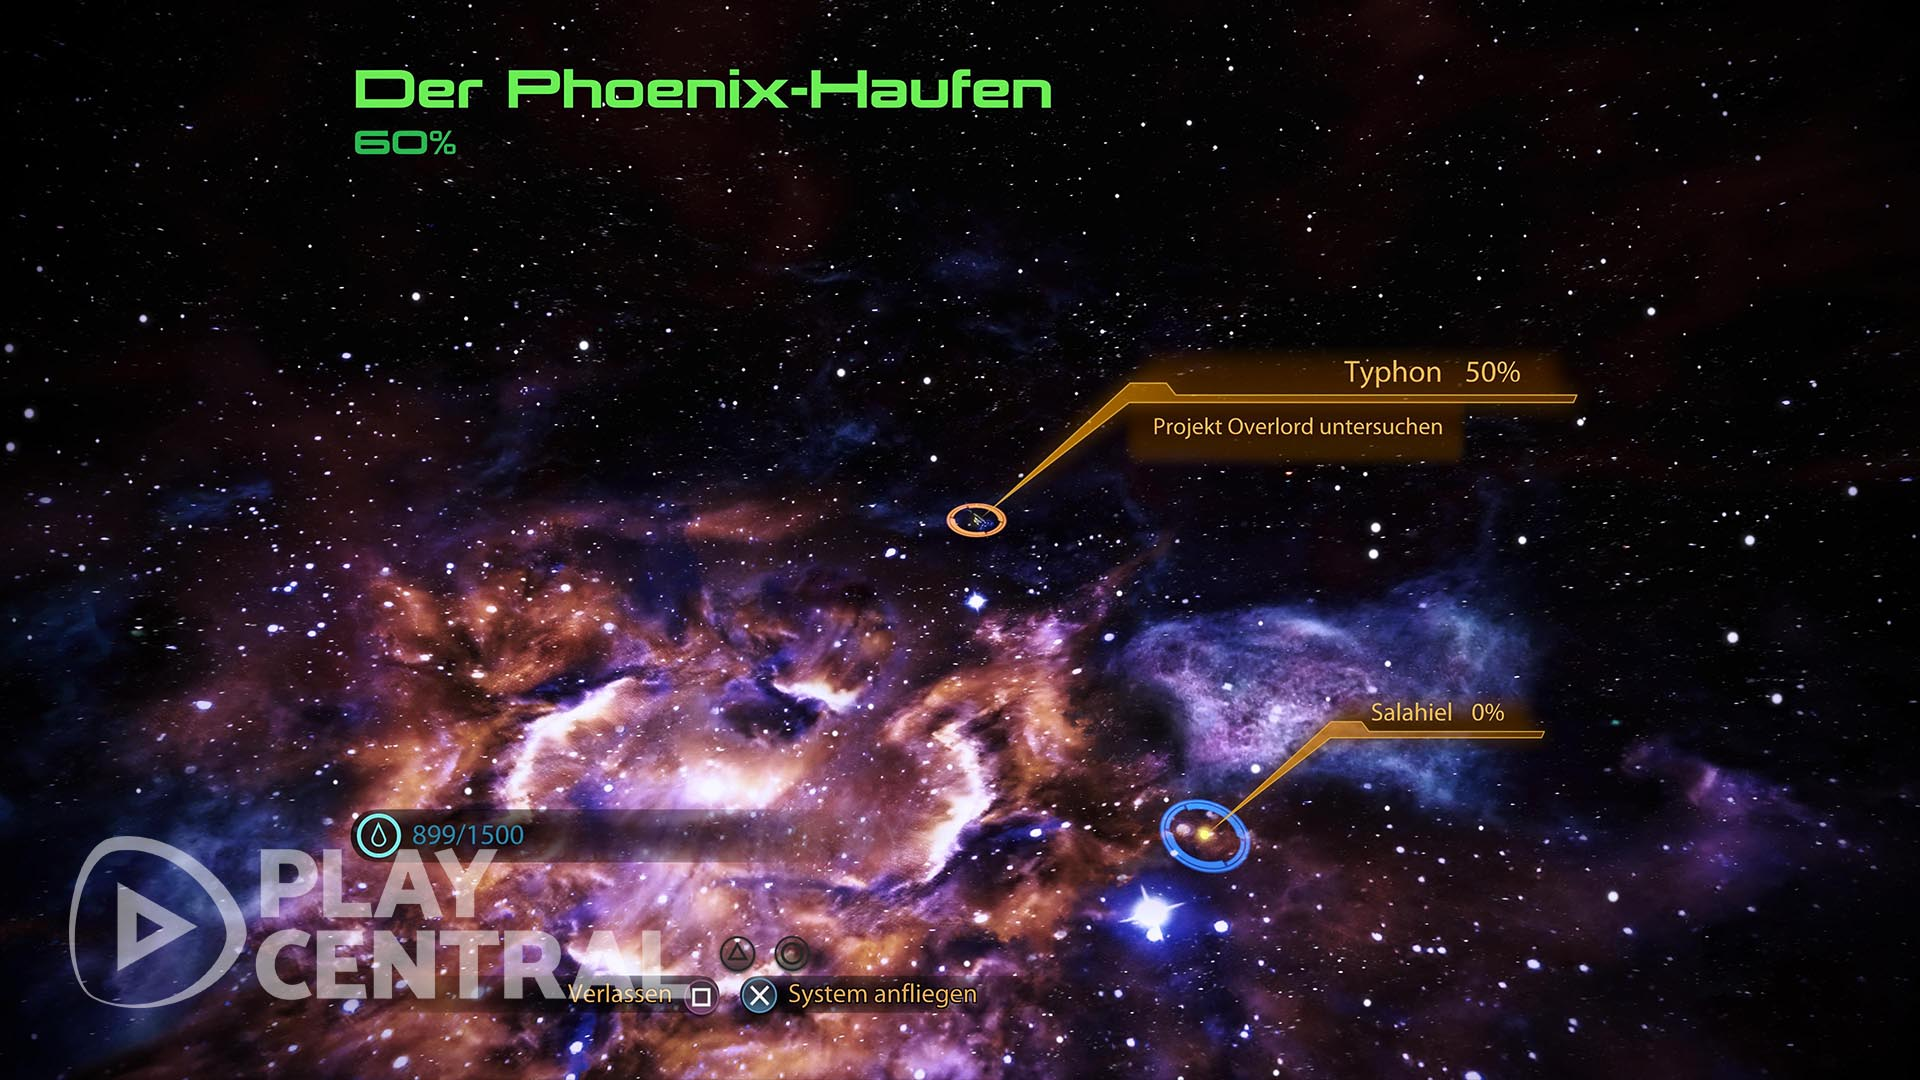 Mass Effect 2 - Element Zero finden - Phoenix-Nebel 1